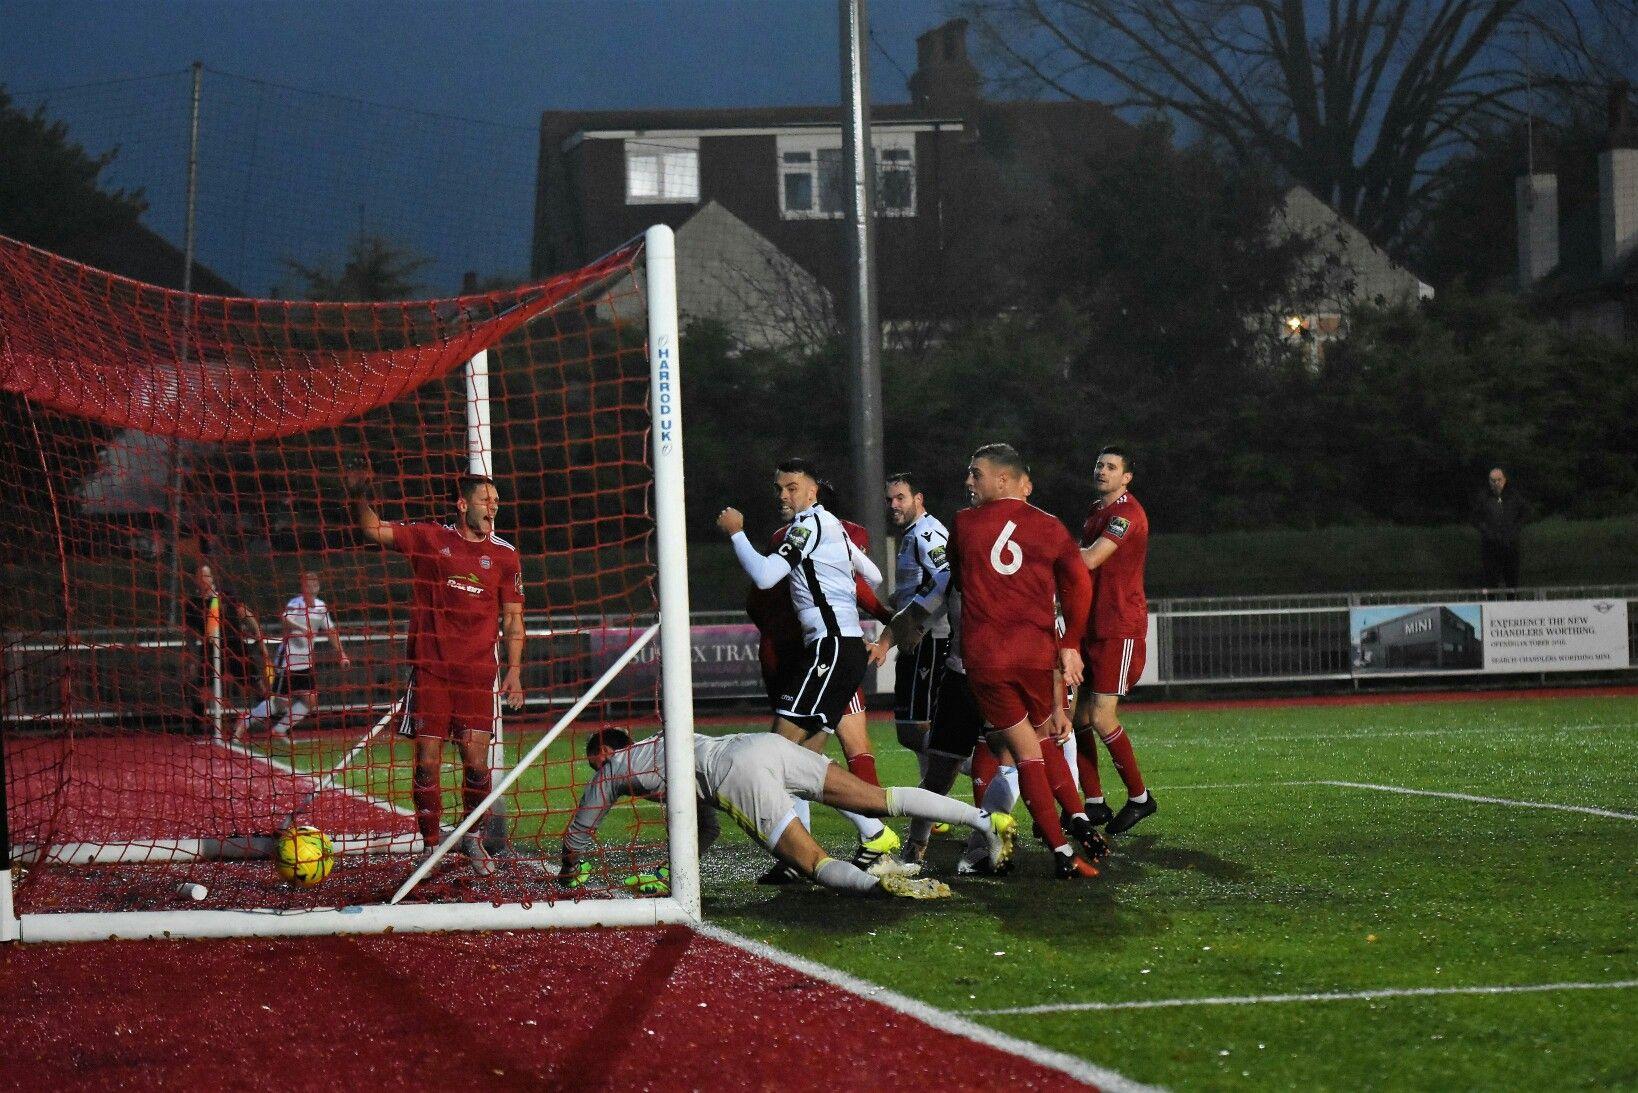 Pin on Stortford FC